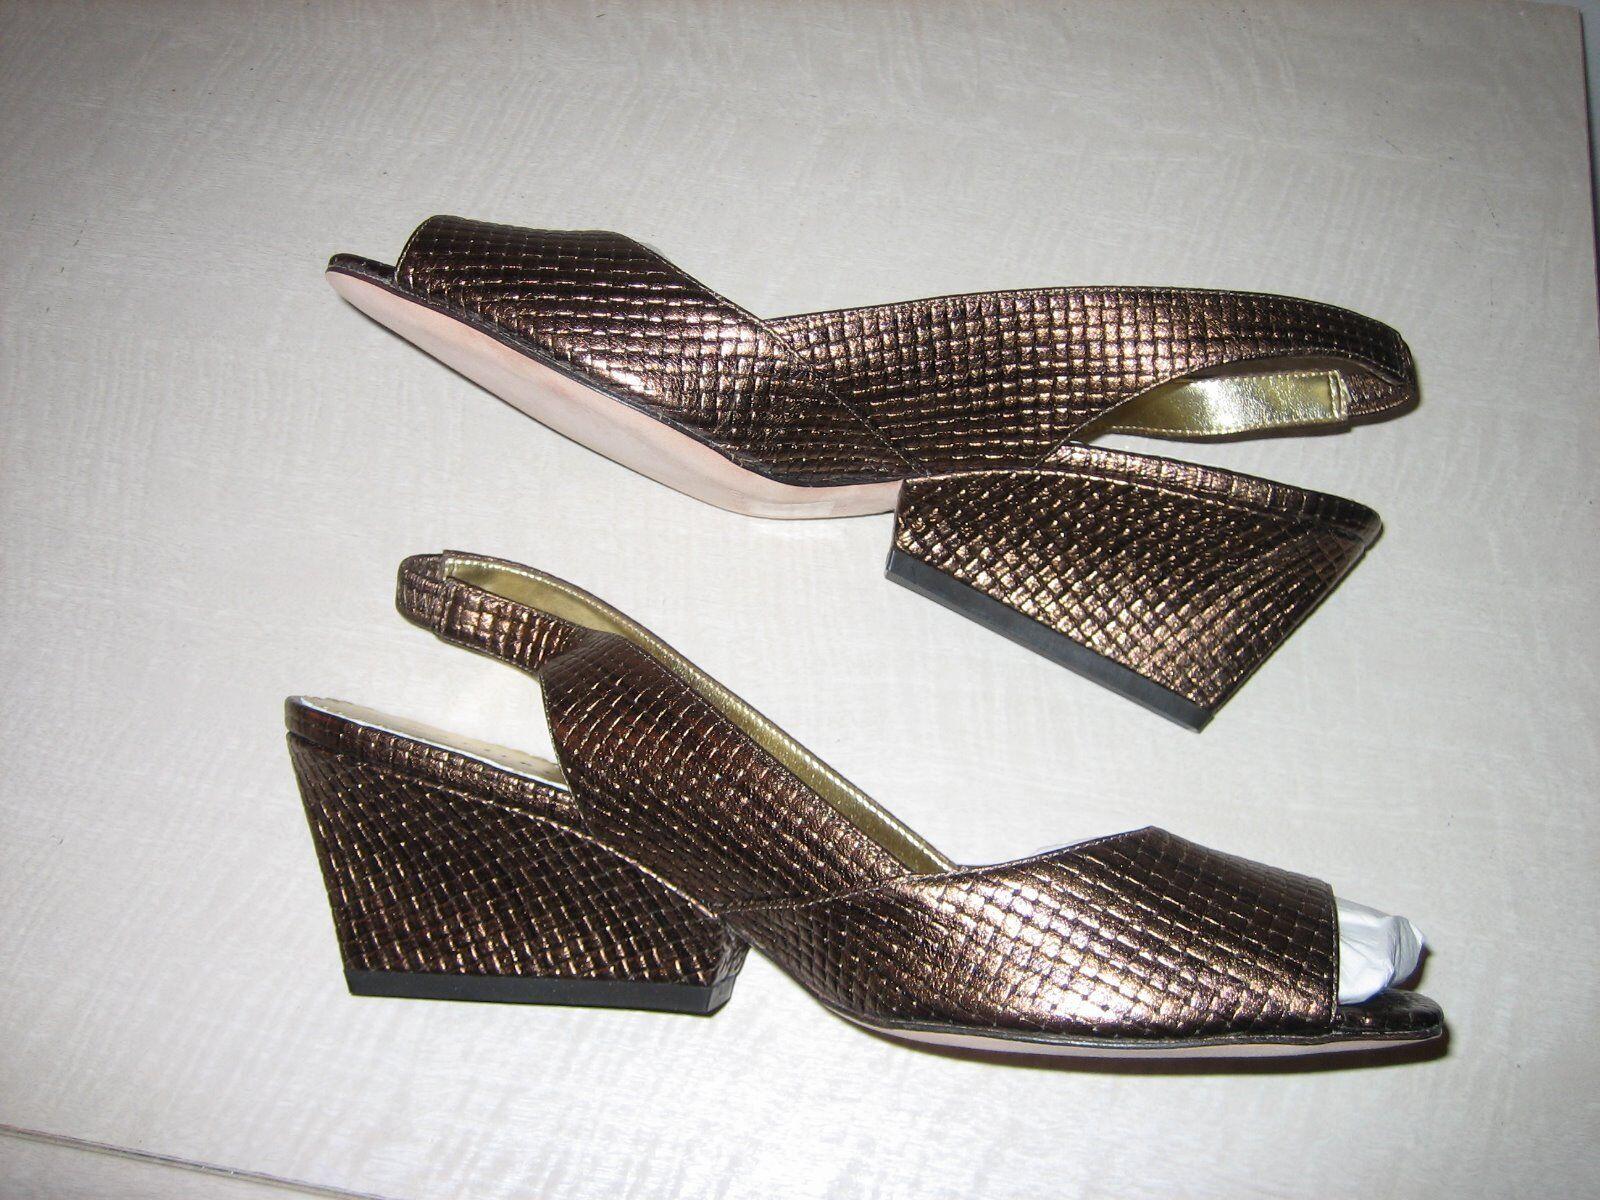 Martinez Valero woven bronze leather contourot wedge - New never been worn